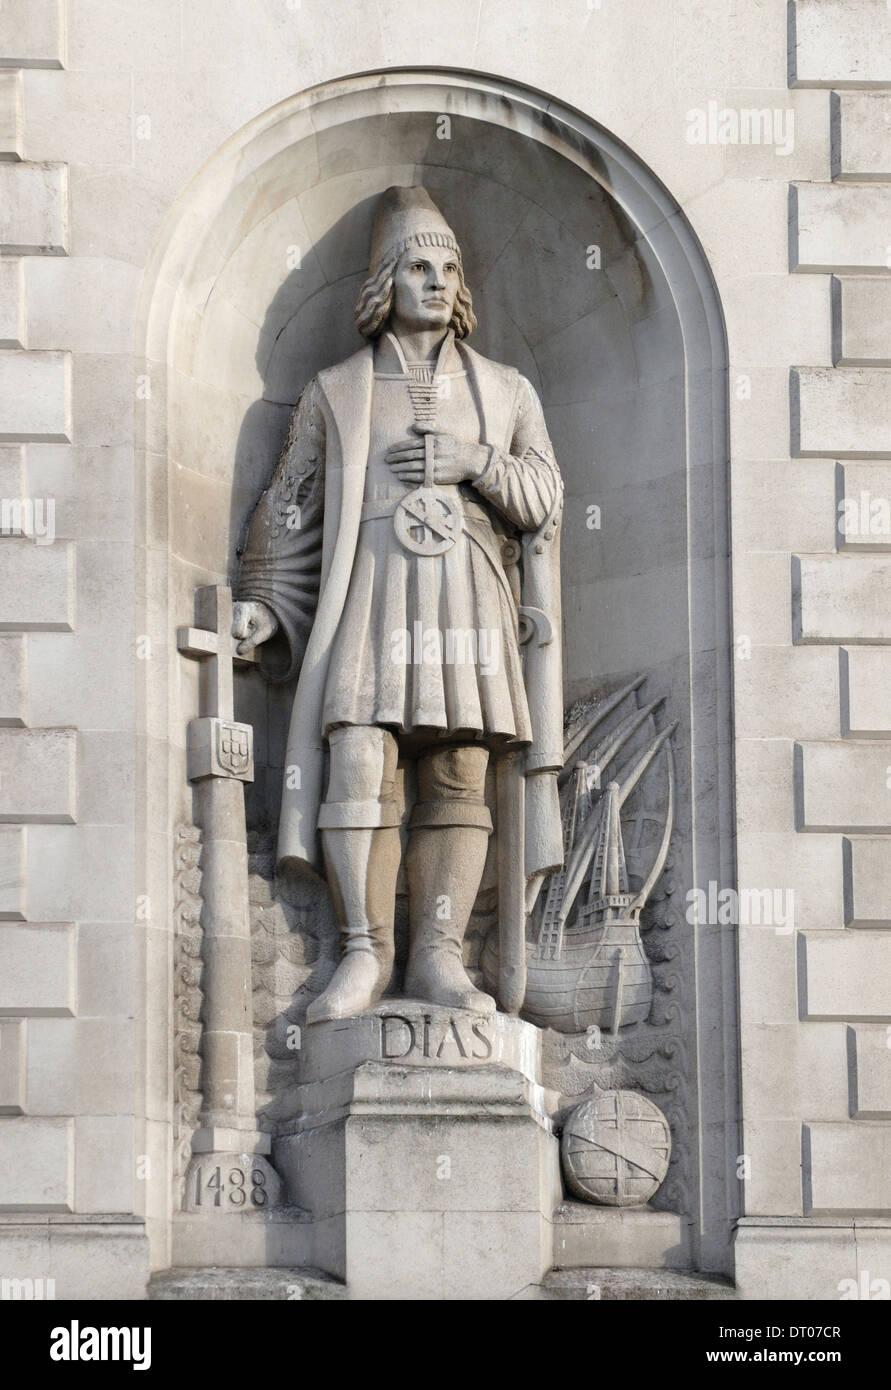 London, England, UK. Statue of Bartolomeu / Bartholomew Dias (Portuguese explorer) on facade of South Africa House, Trafalgar Sq - Stock Image